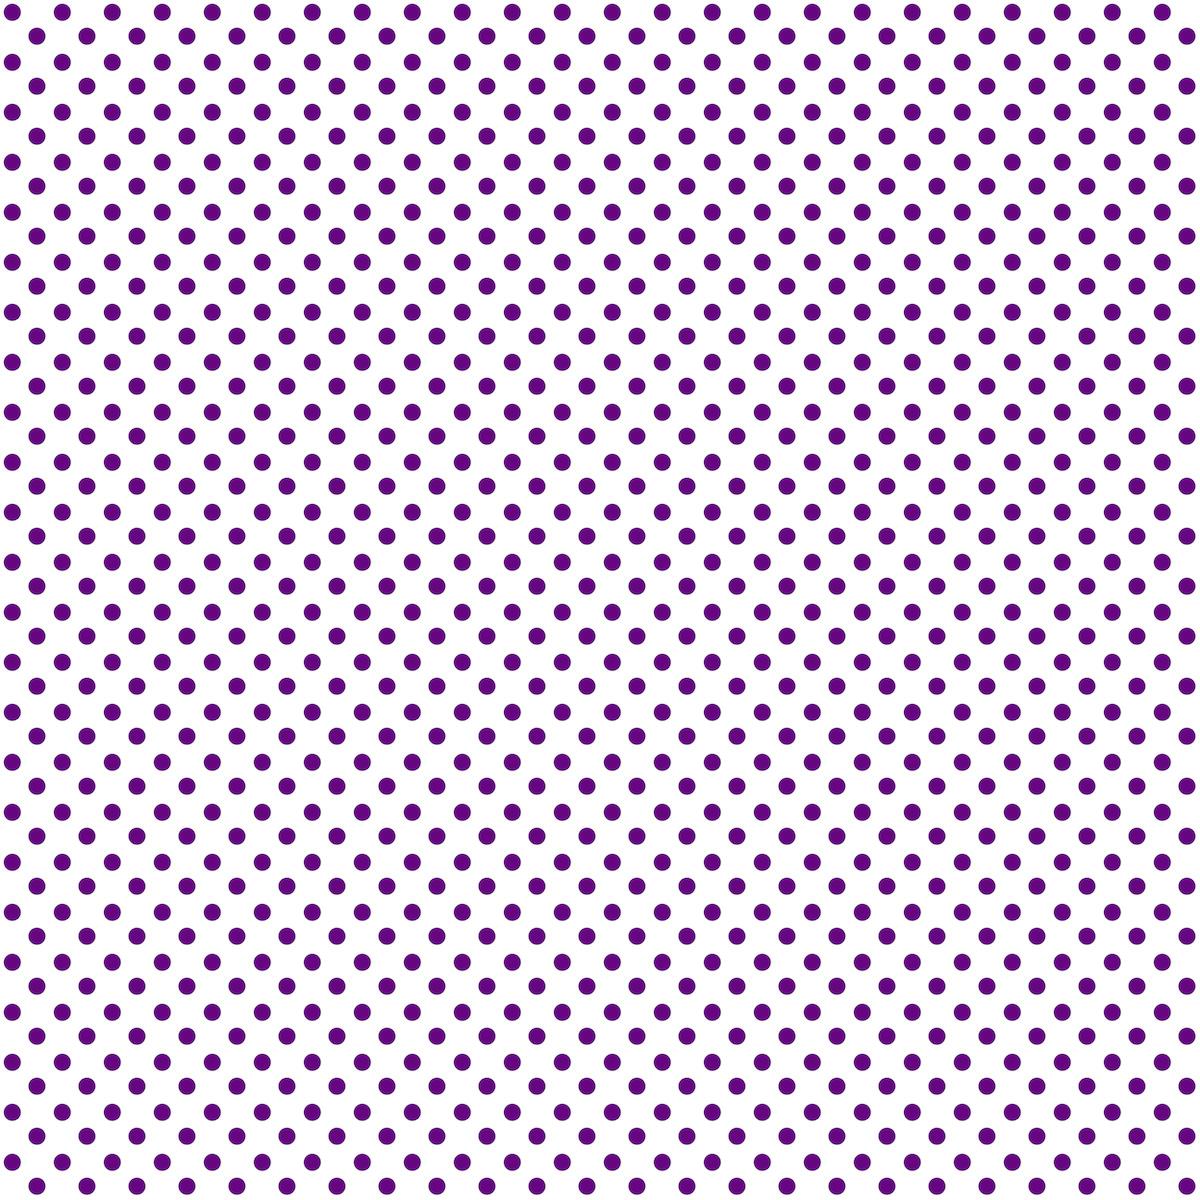 Digital Purple White Polka Dot